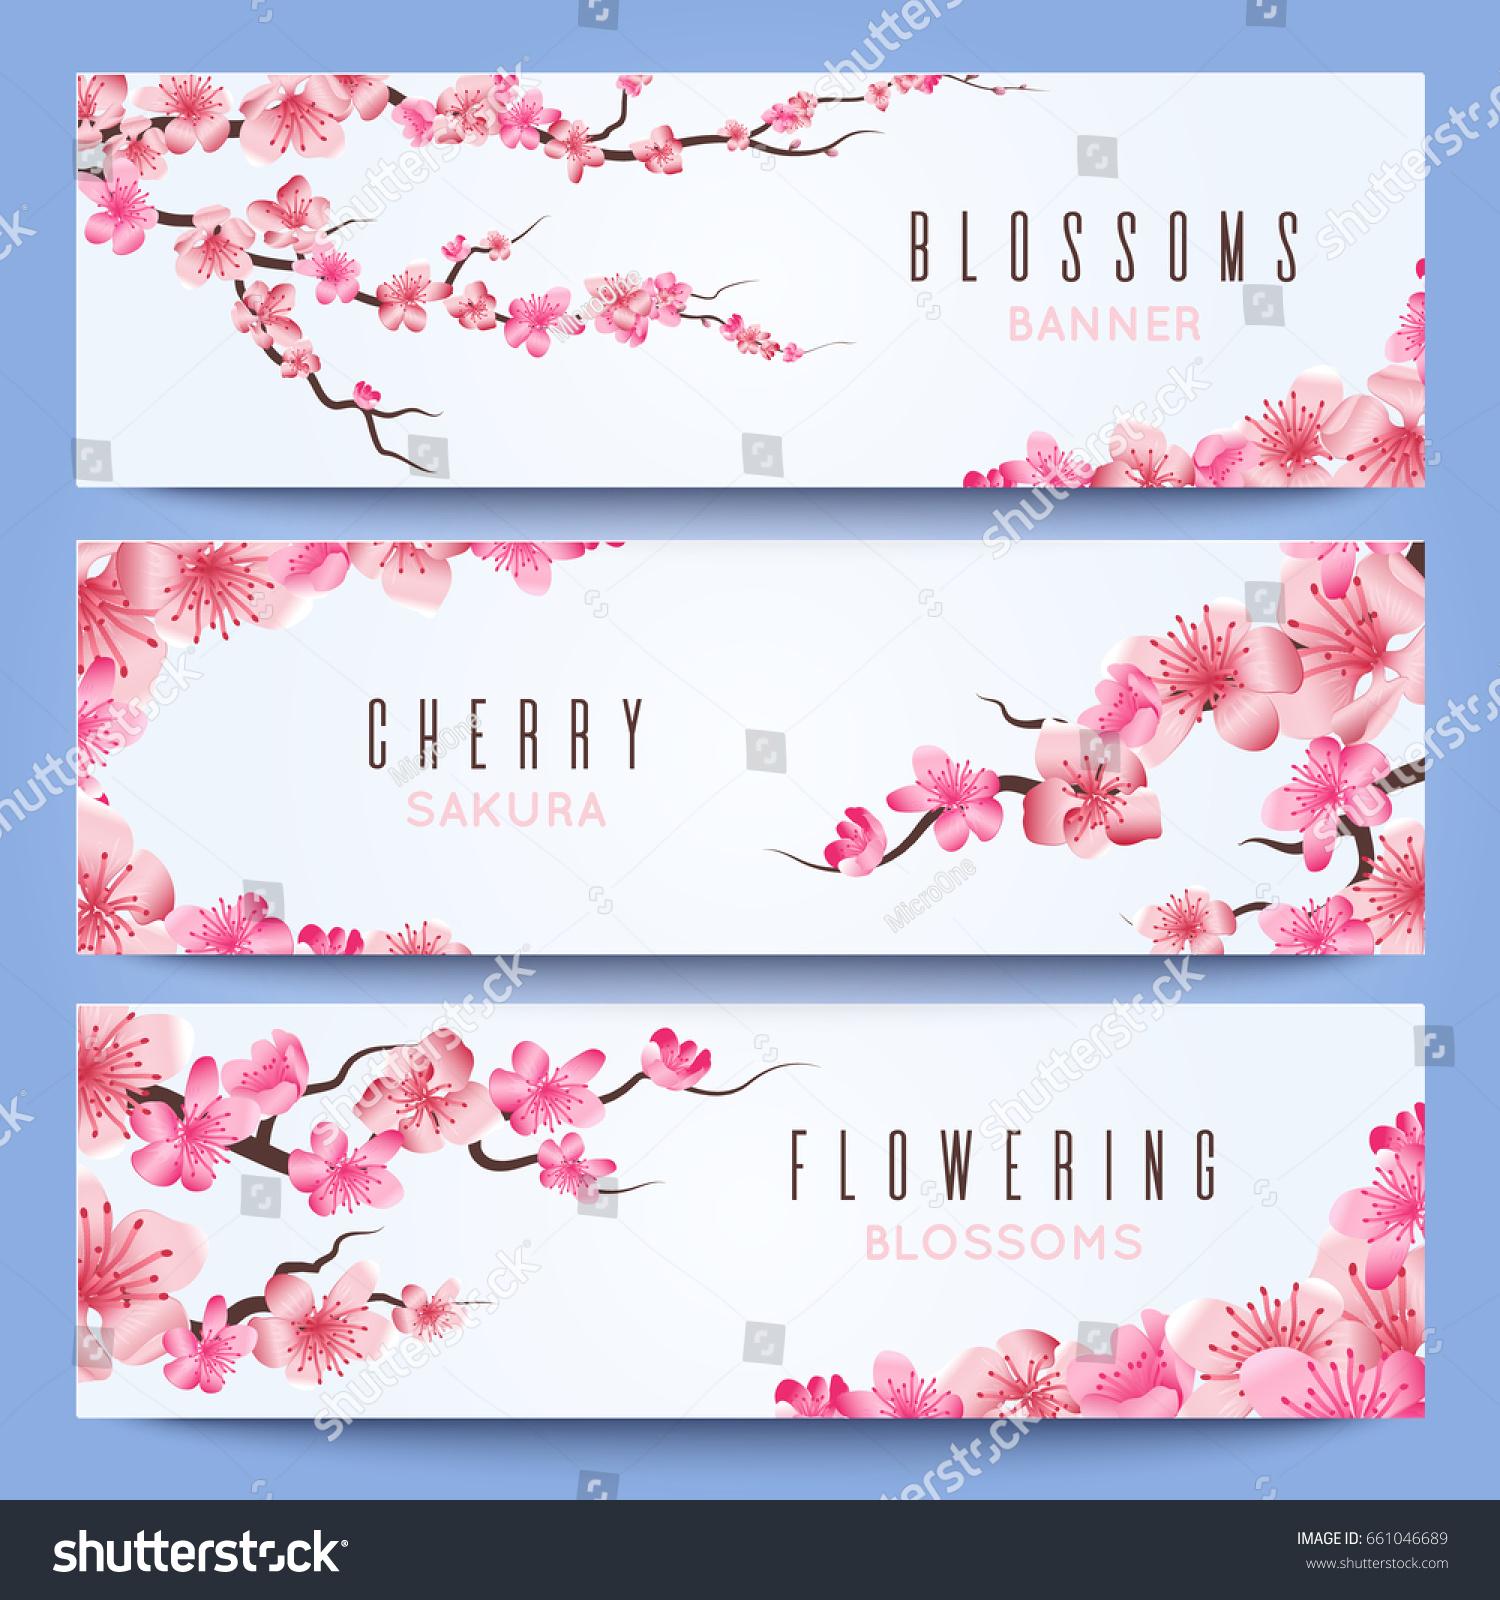 wedding banners template spring japan sakura stock illustration